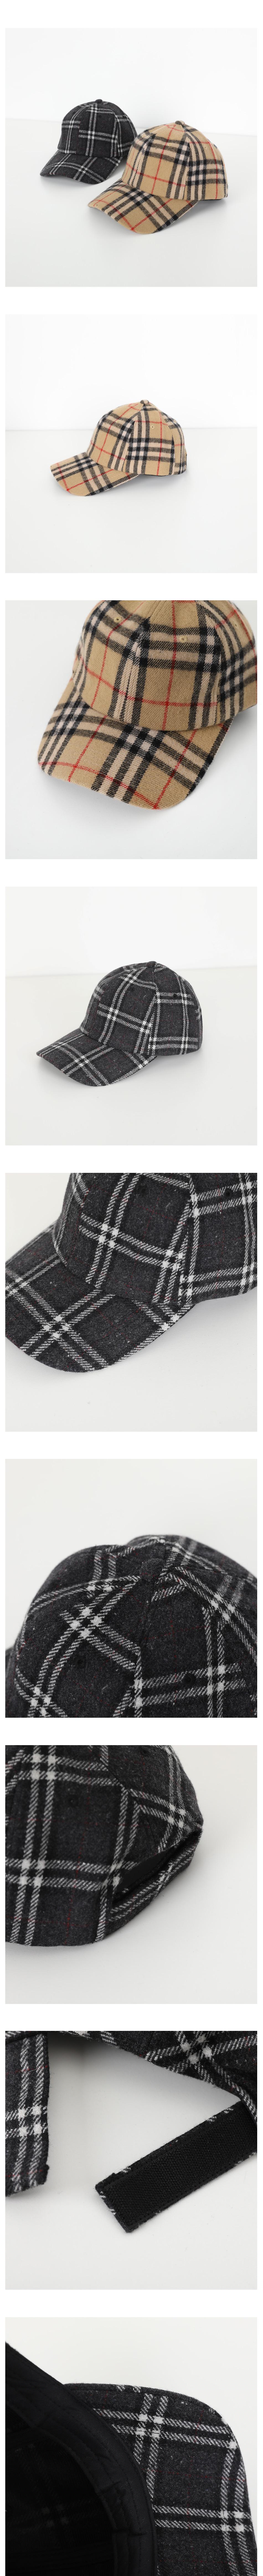 Burberry check cap hat